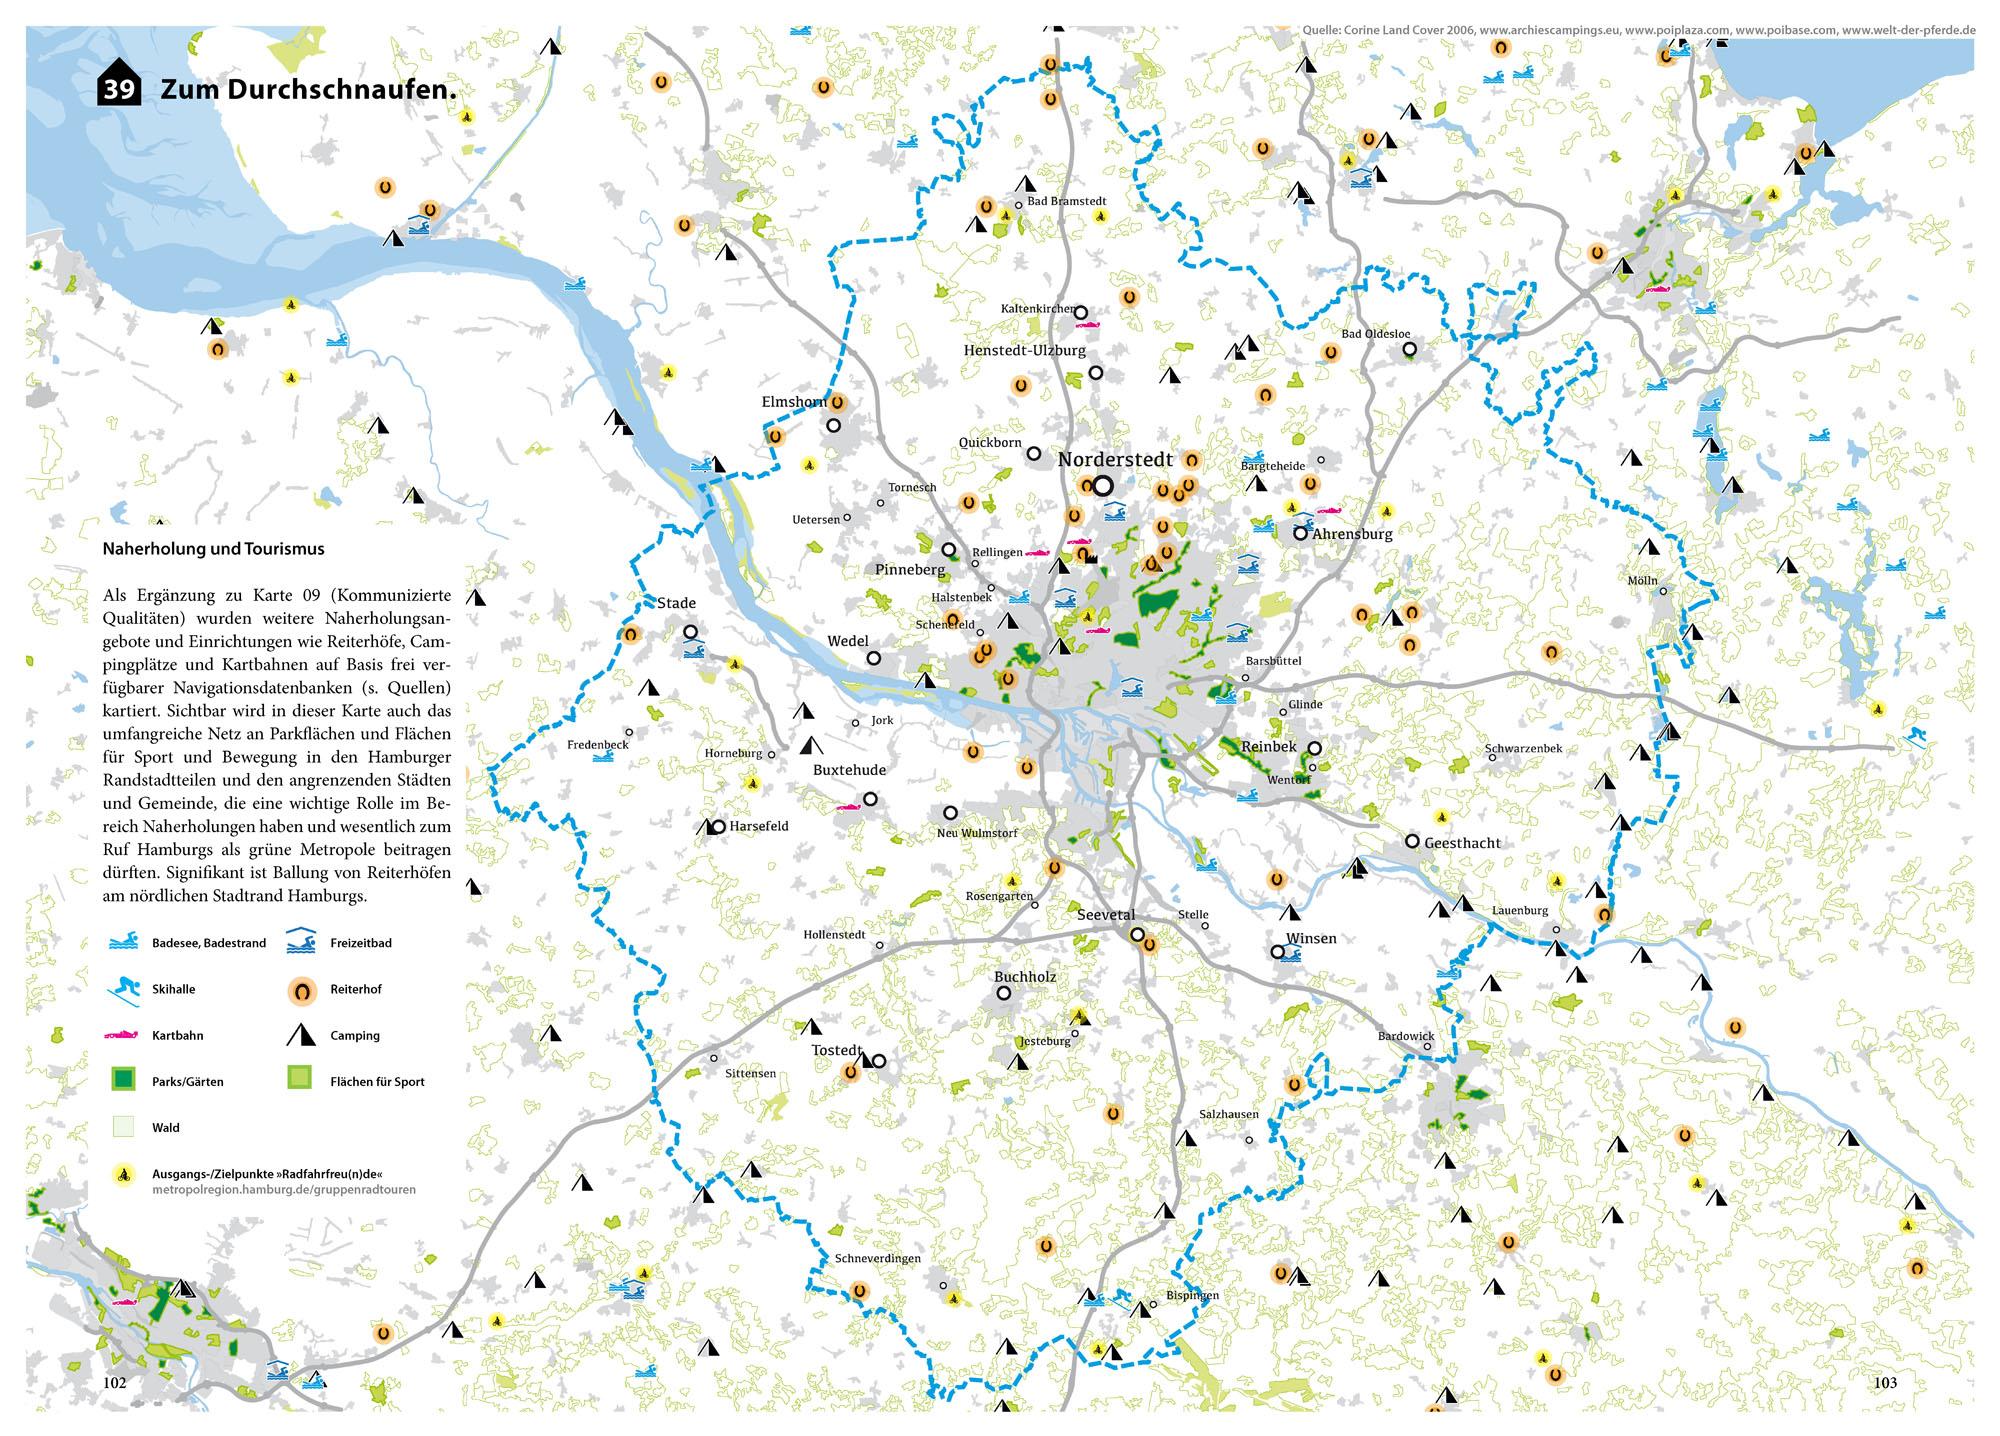 Suburbia Atlas Hamburg Stadteingang Typologien Vorort Karte Freizeit Naherholung Tourismus Karte